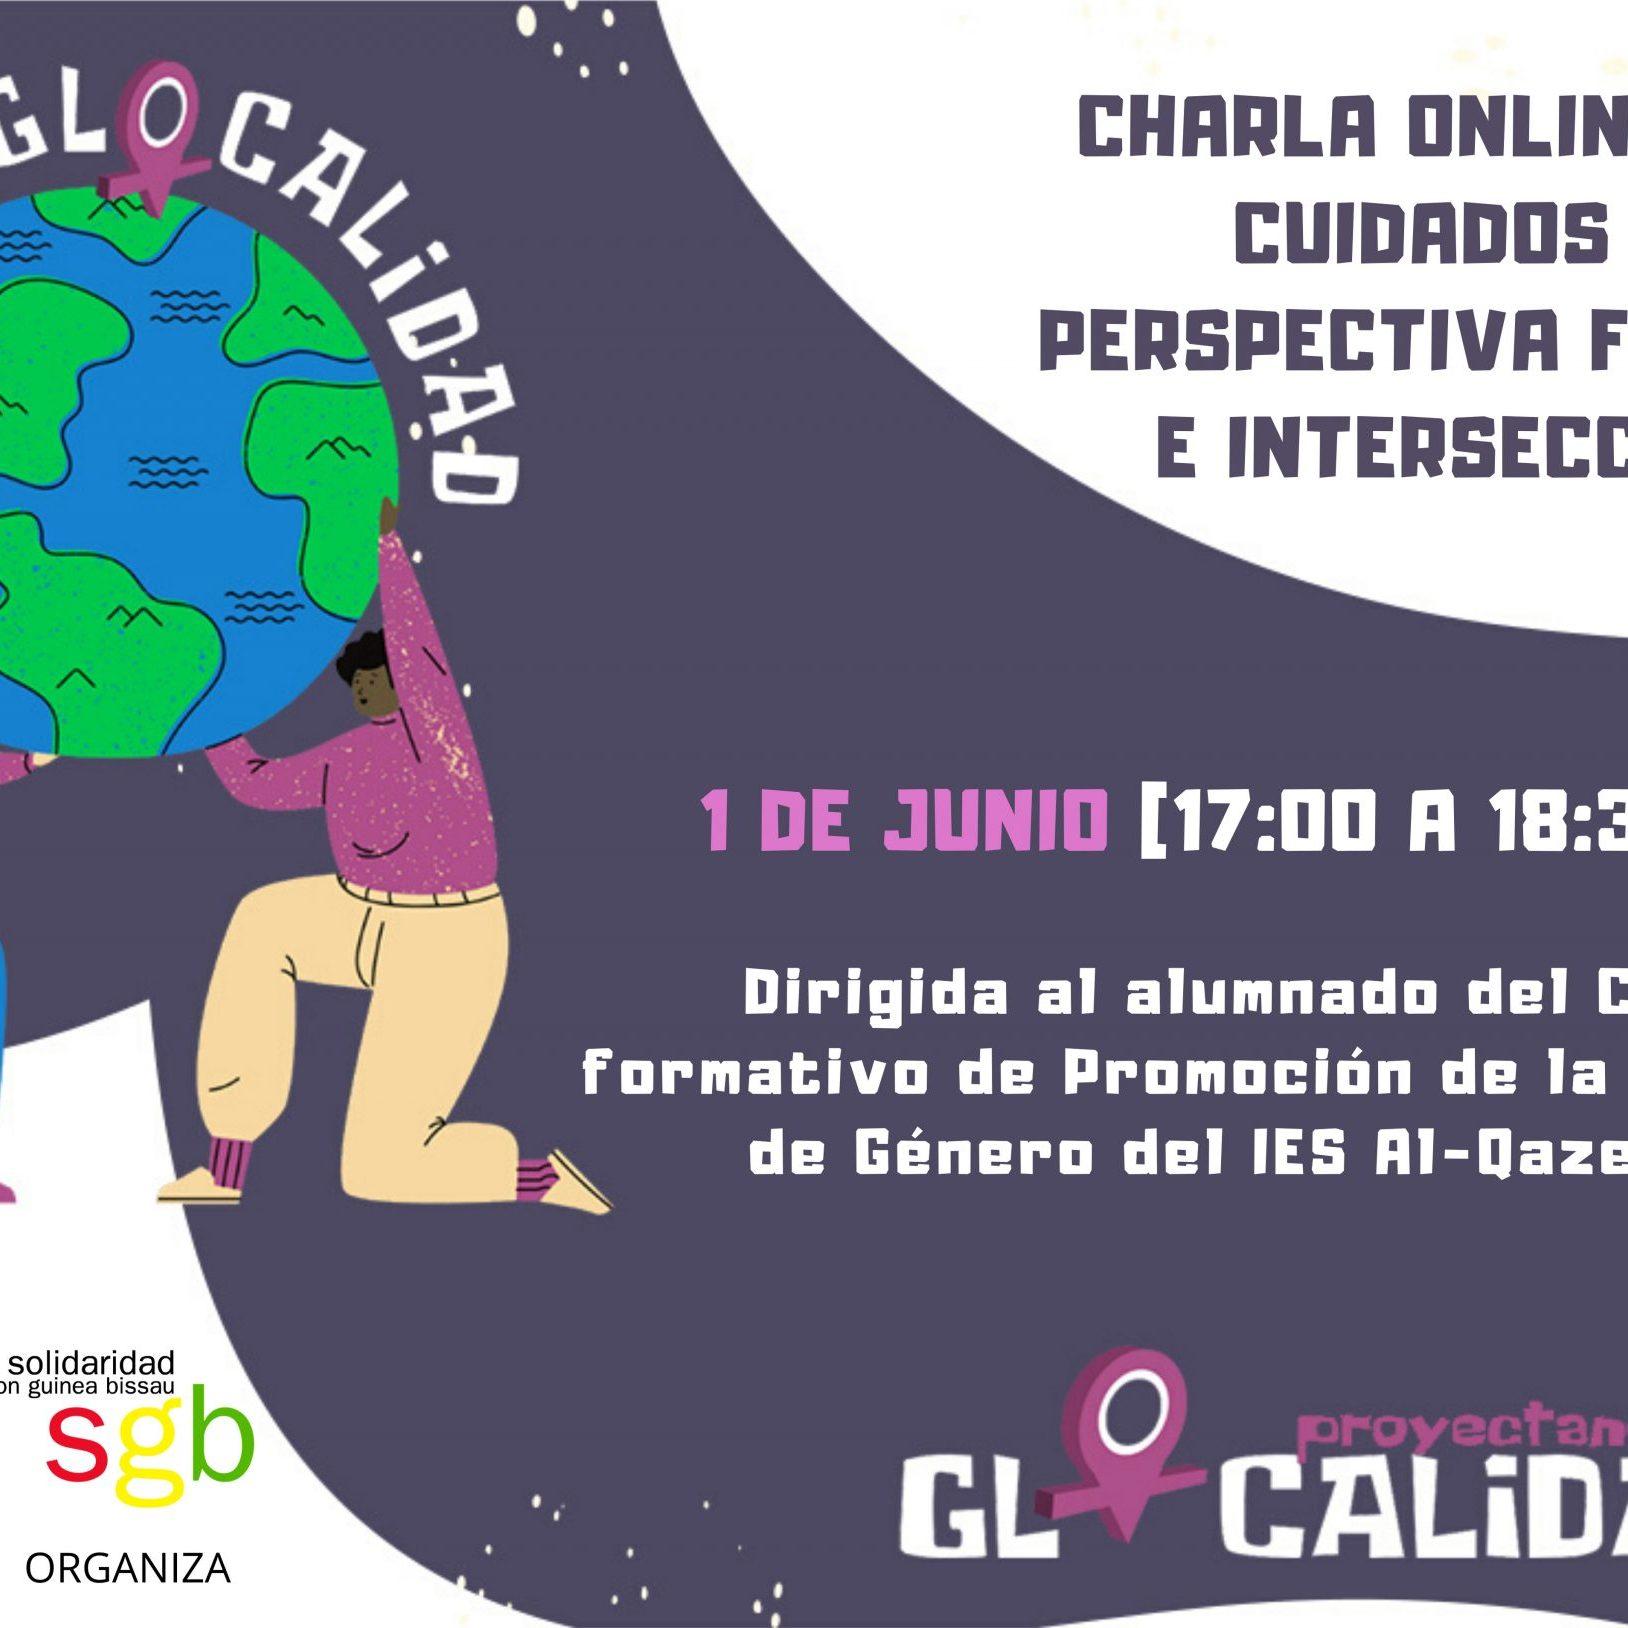 CHARLA ONLINE SOBRE CUIDADOS CON PERSPECTIVA FEMINISTA E INTERSECCIONAL-2